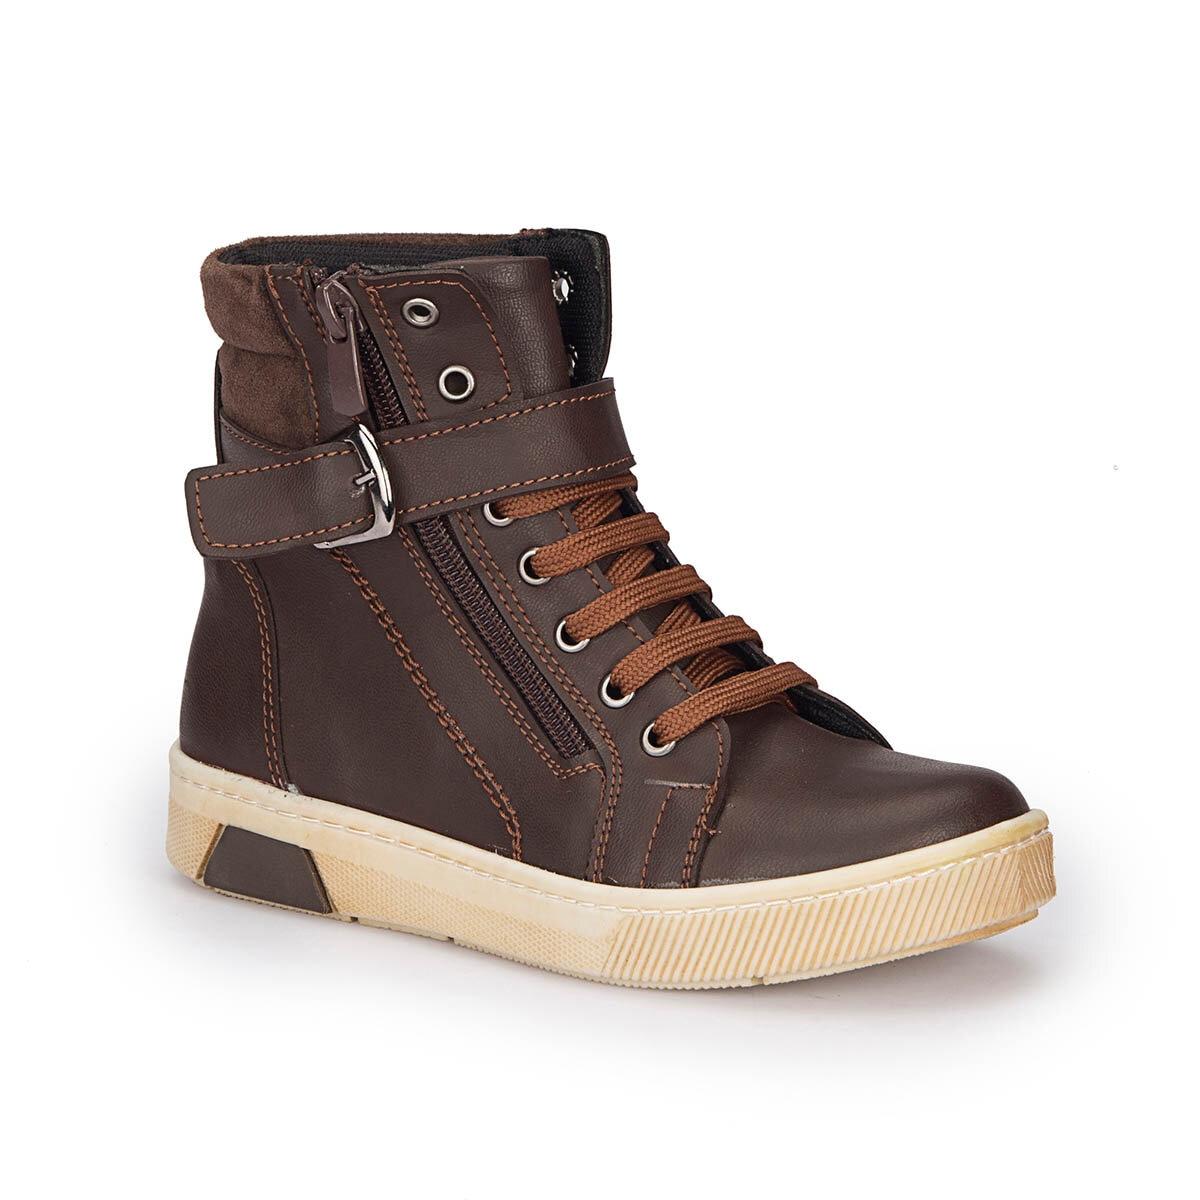 FLO 72.509755.F Brown Male Child Sneaker Shoes Polaris